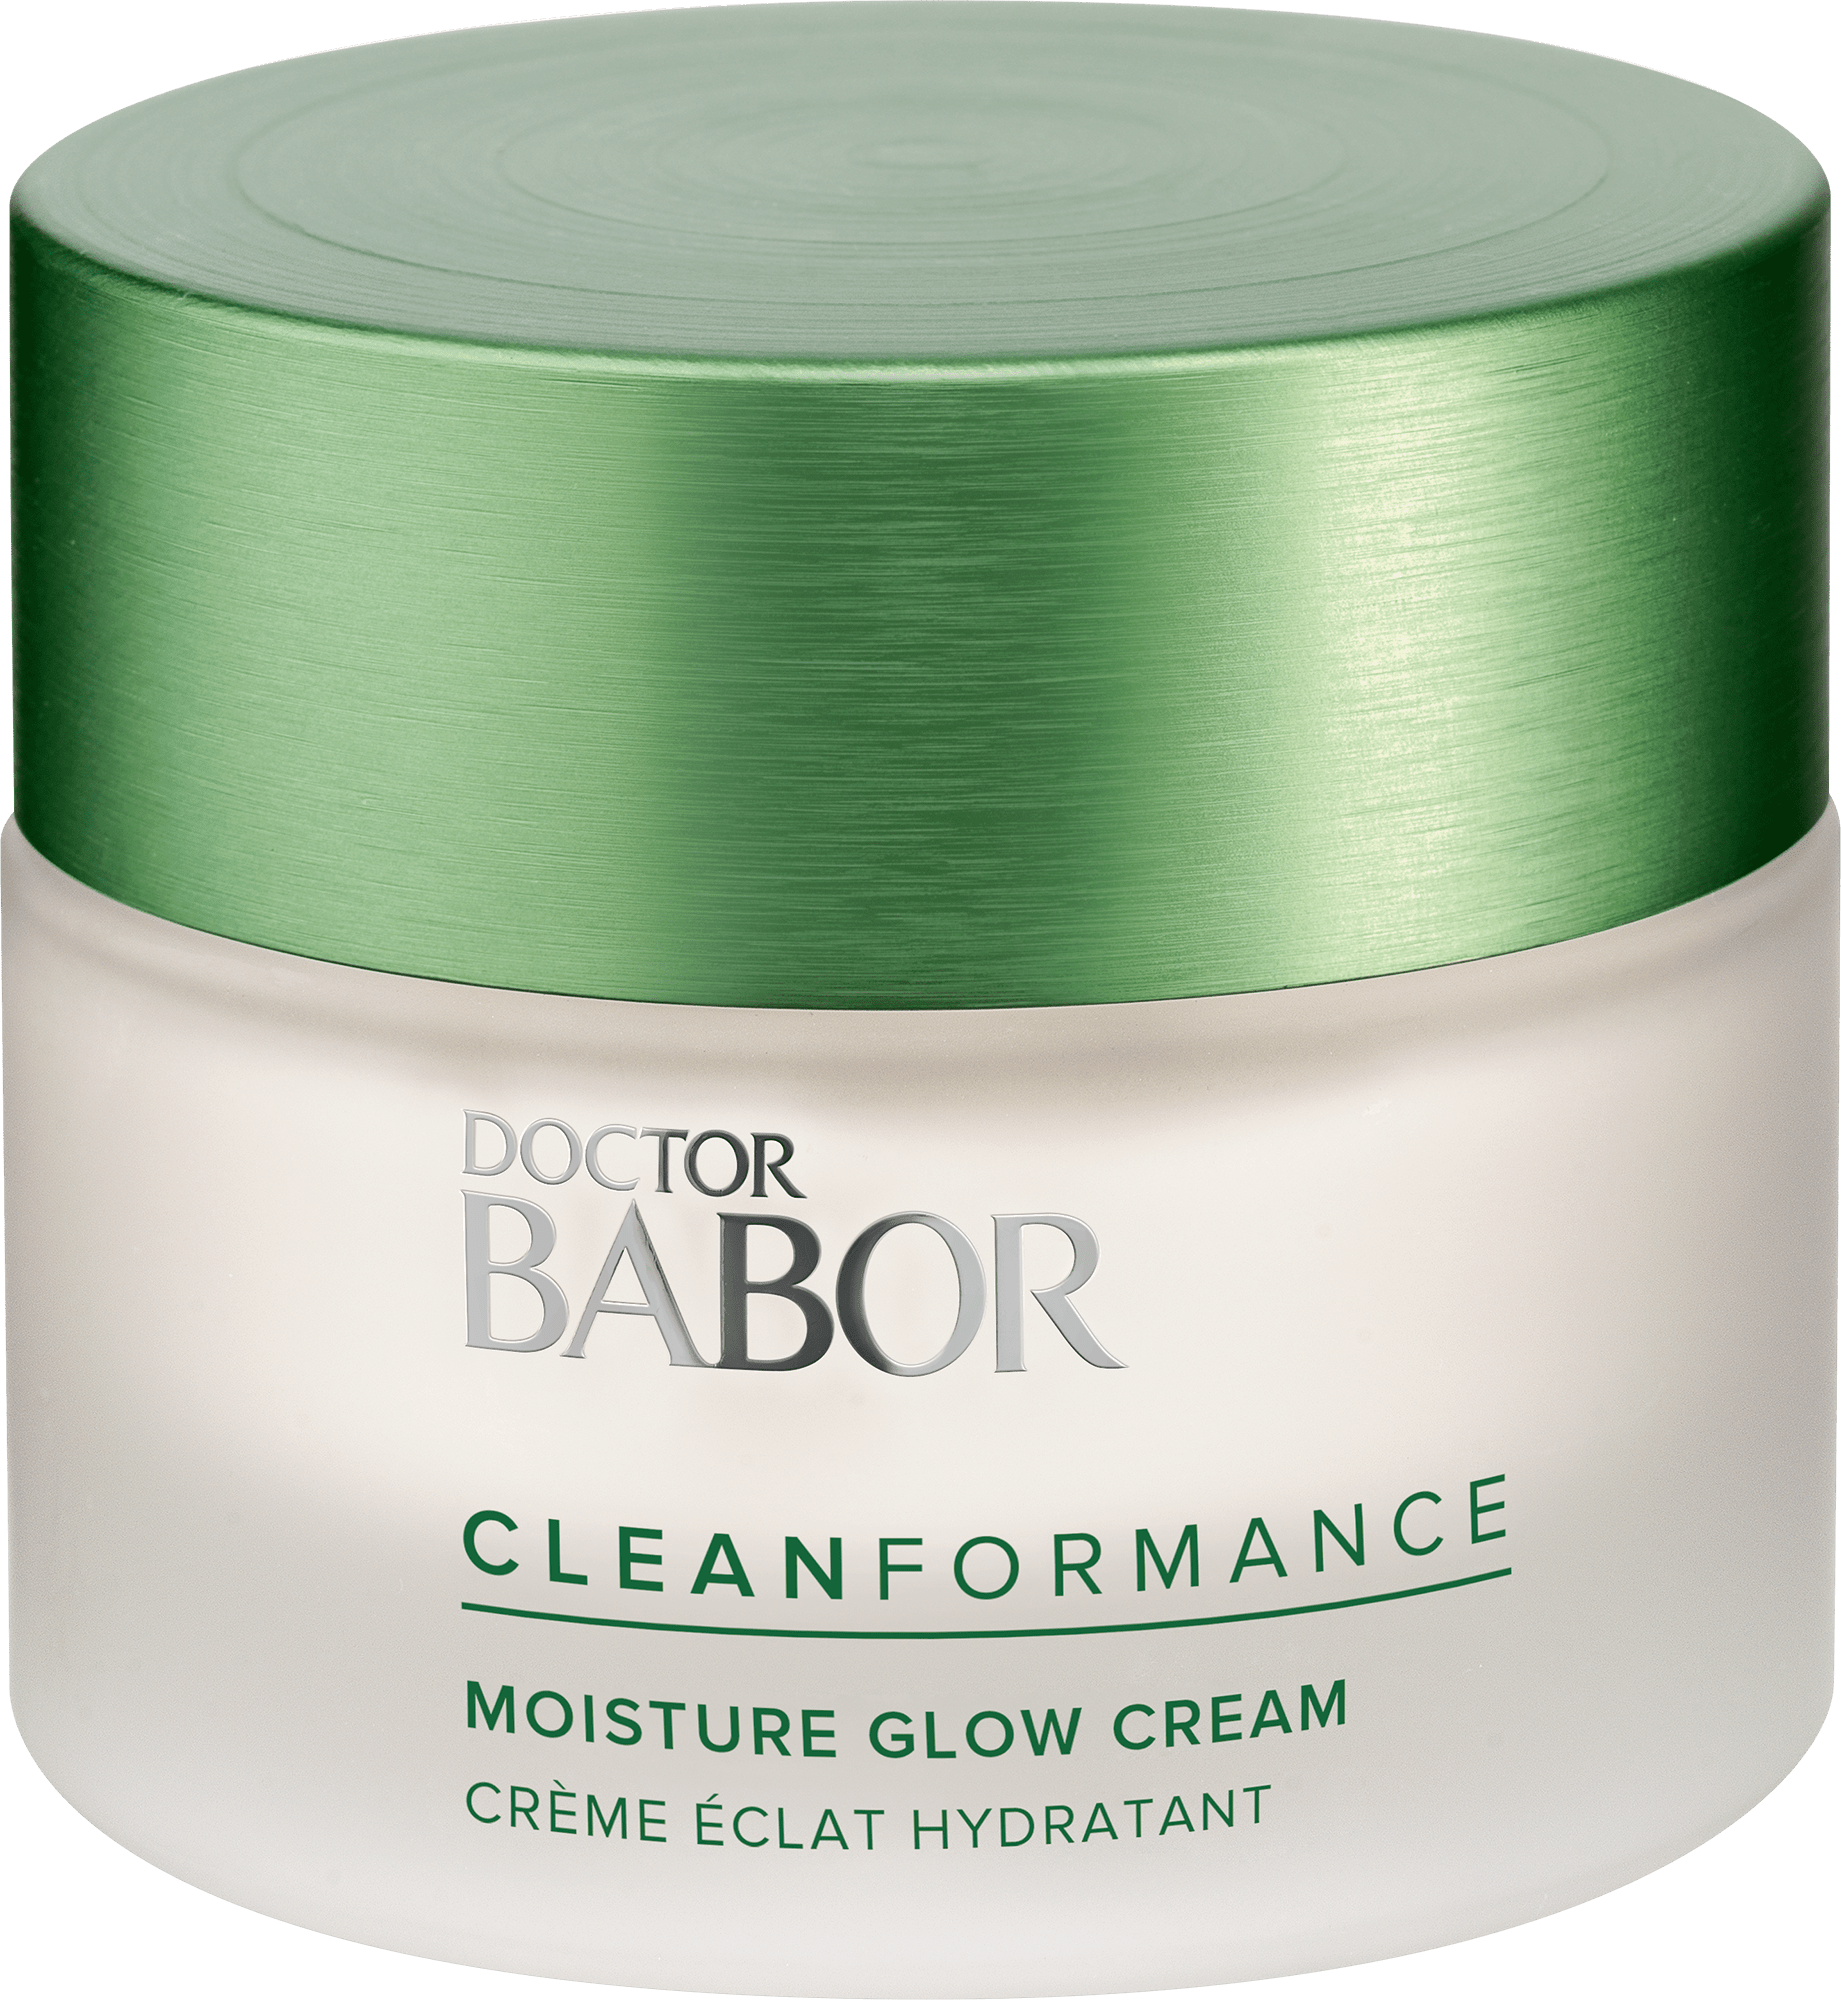 DOCTOR BABOR CLEANFORMANCE Moisture Glow Day Cream